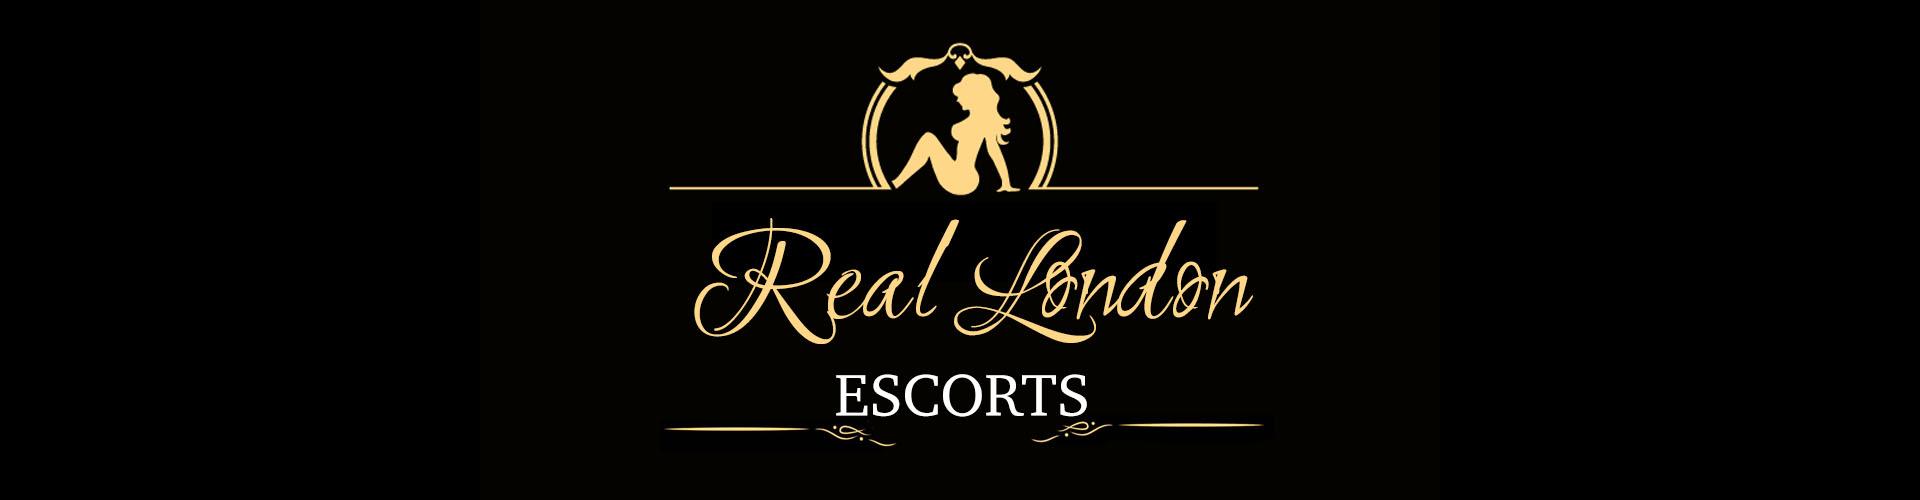 real london escorts logo